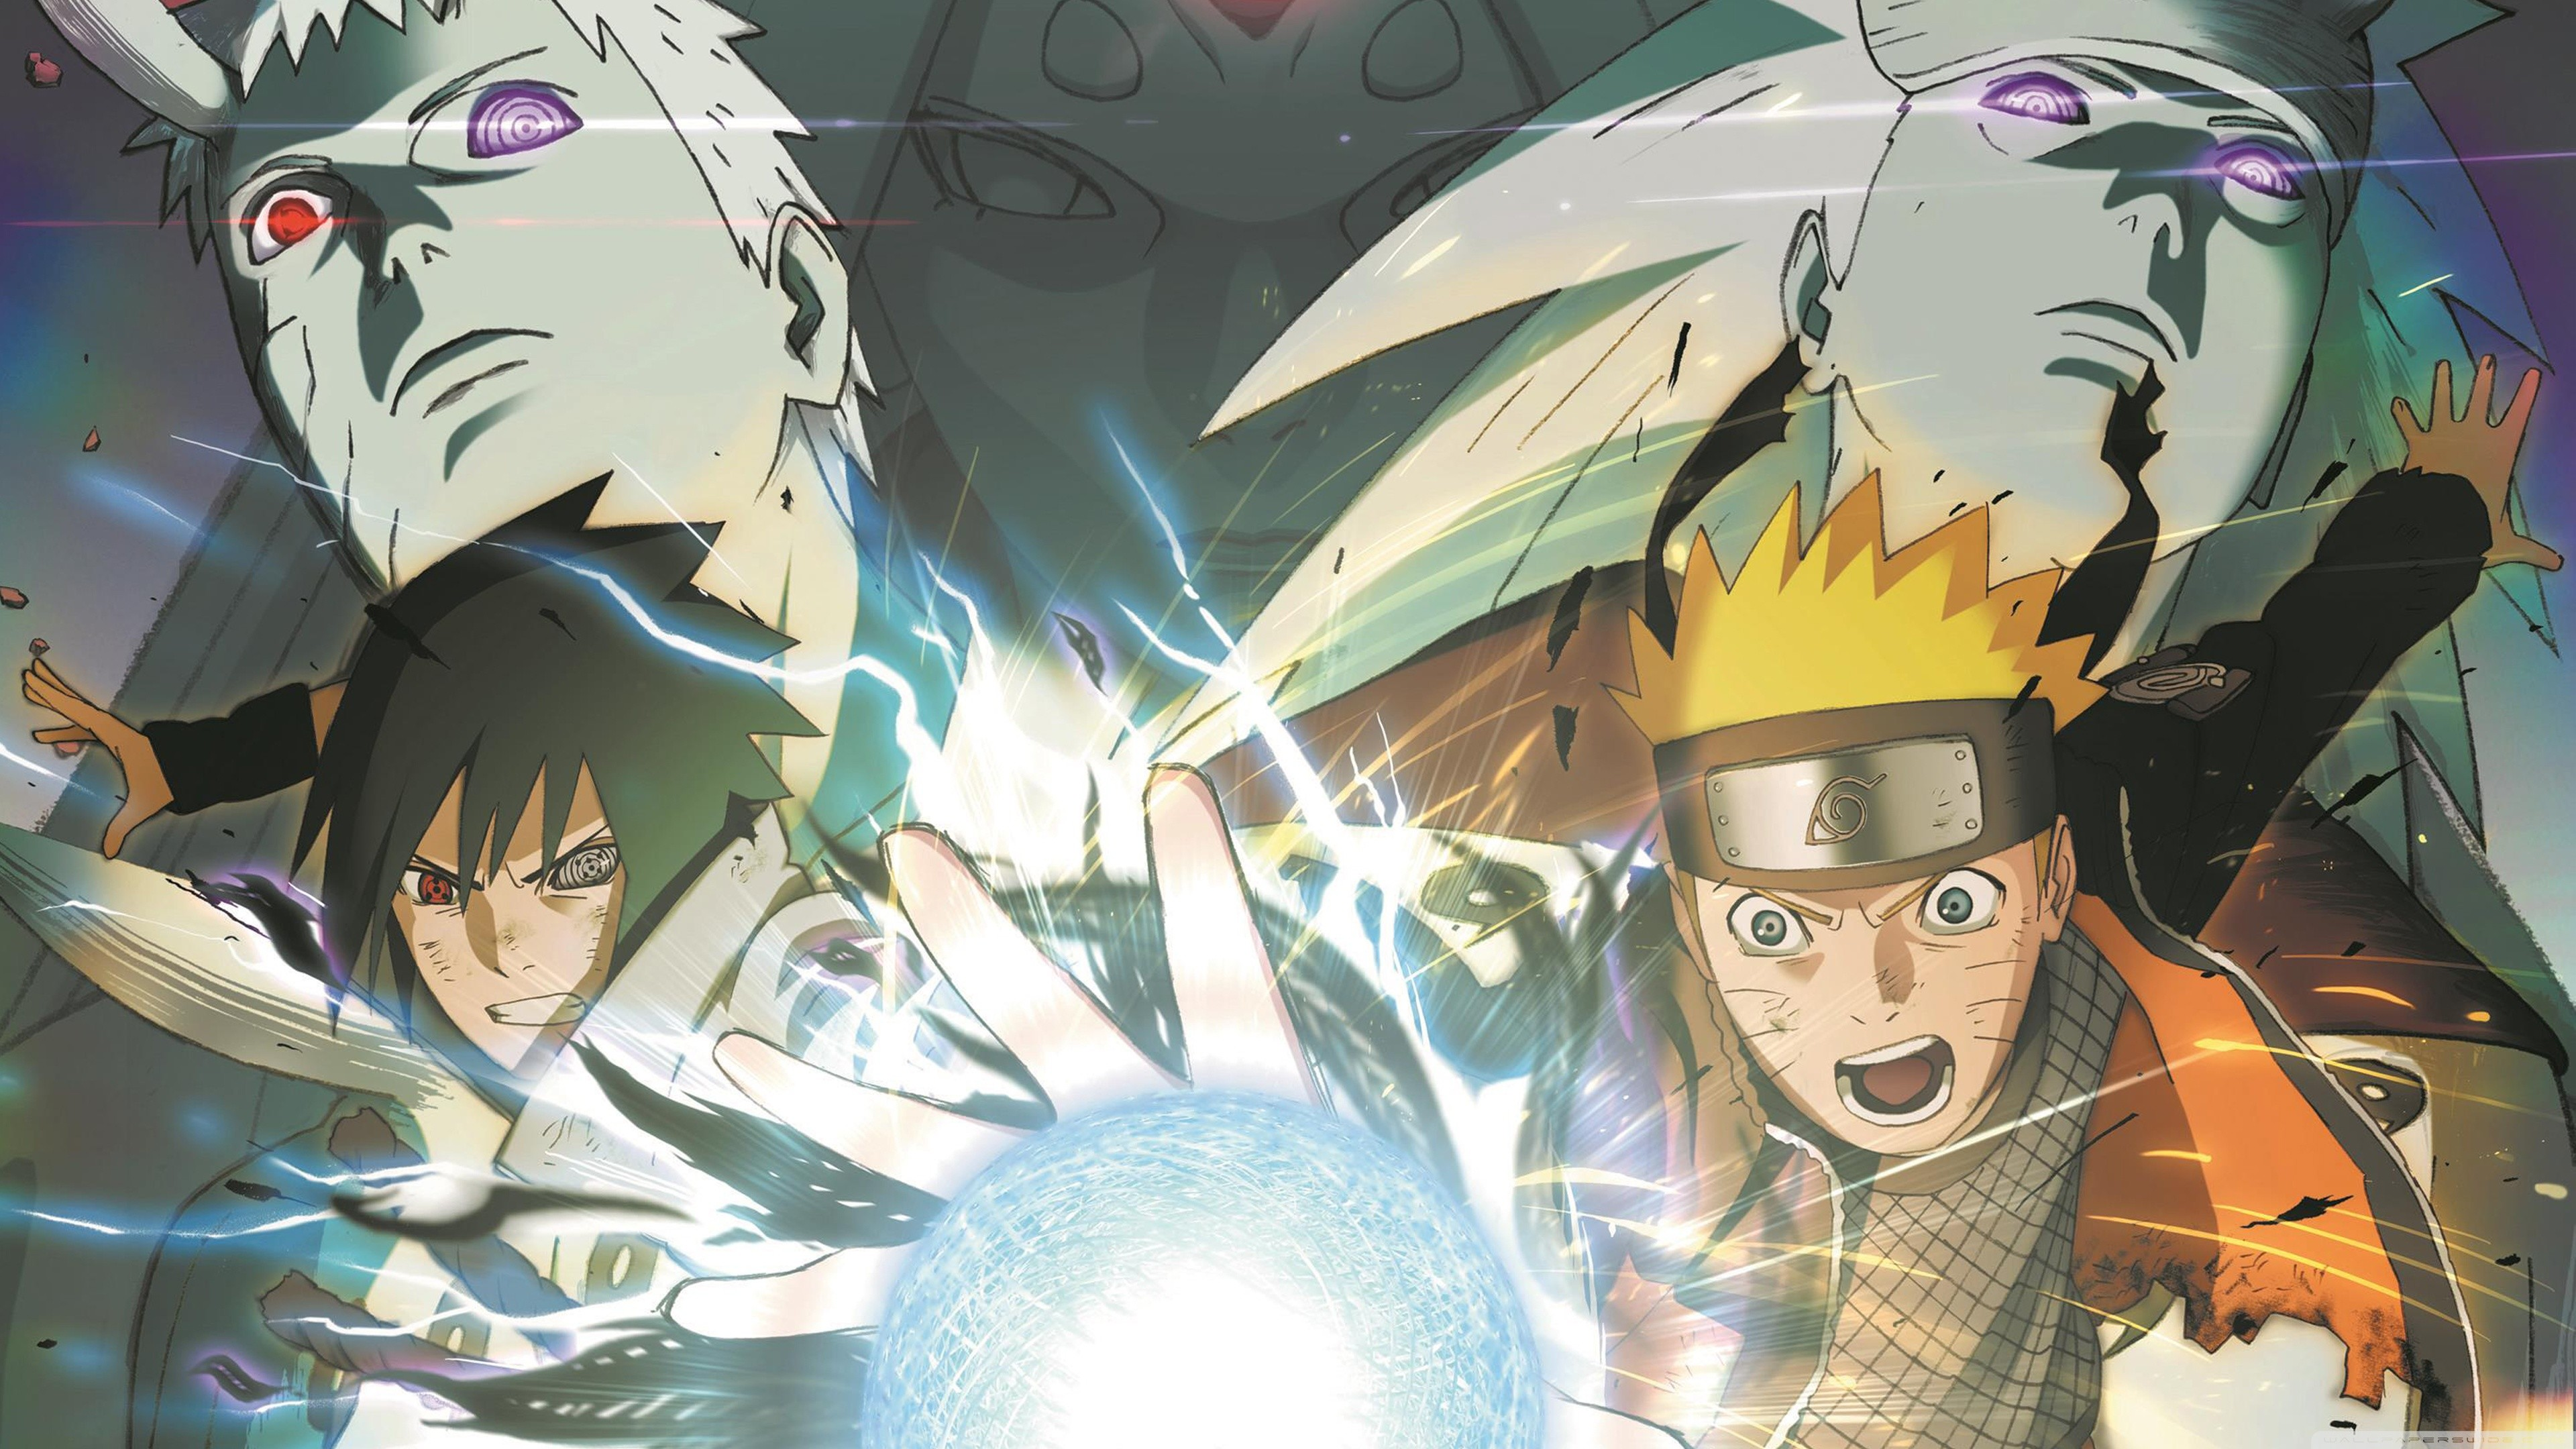 Naruto Shippuden 4k Ultra Hd Wallpaper Background Image 3840x2160 Id 1002905 Wallpaper Abyss Six paths madara uchiha wallpaper 4k. naruto shippuden 4k ultra hd wallpaper